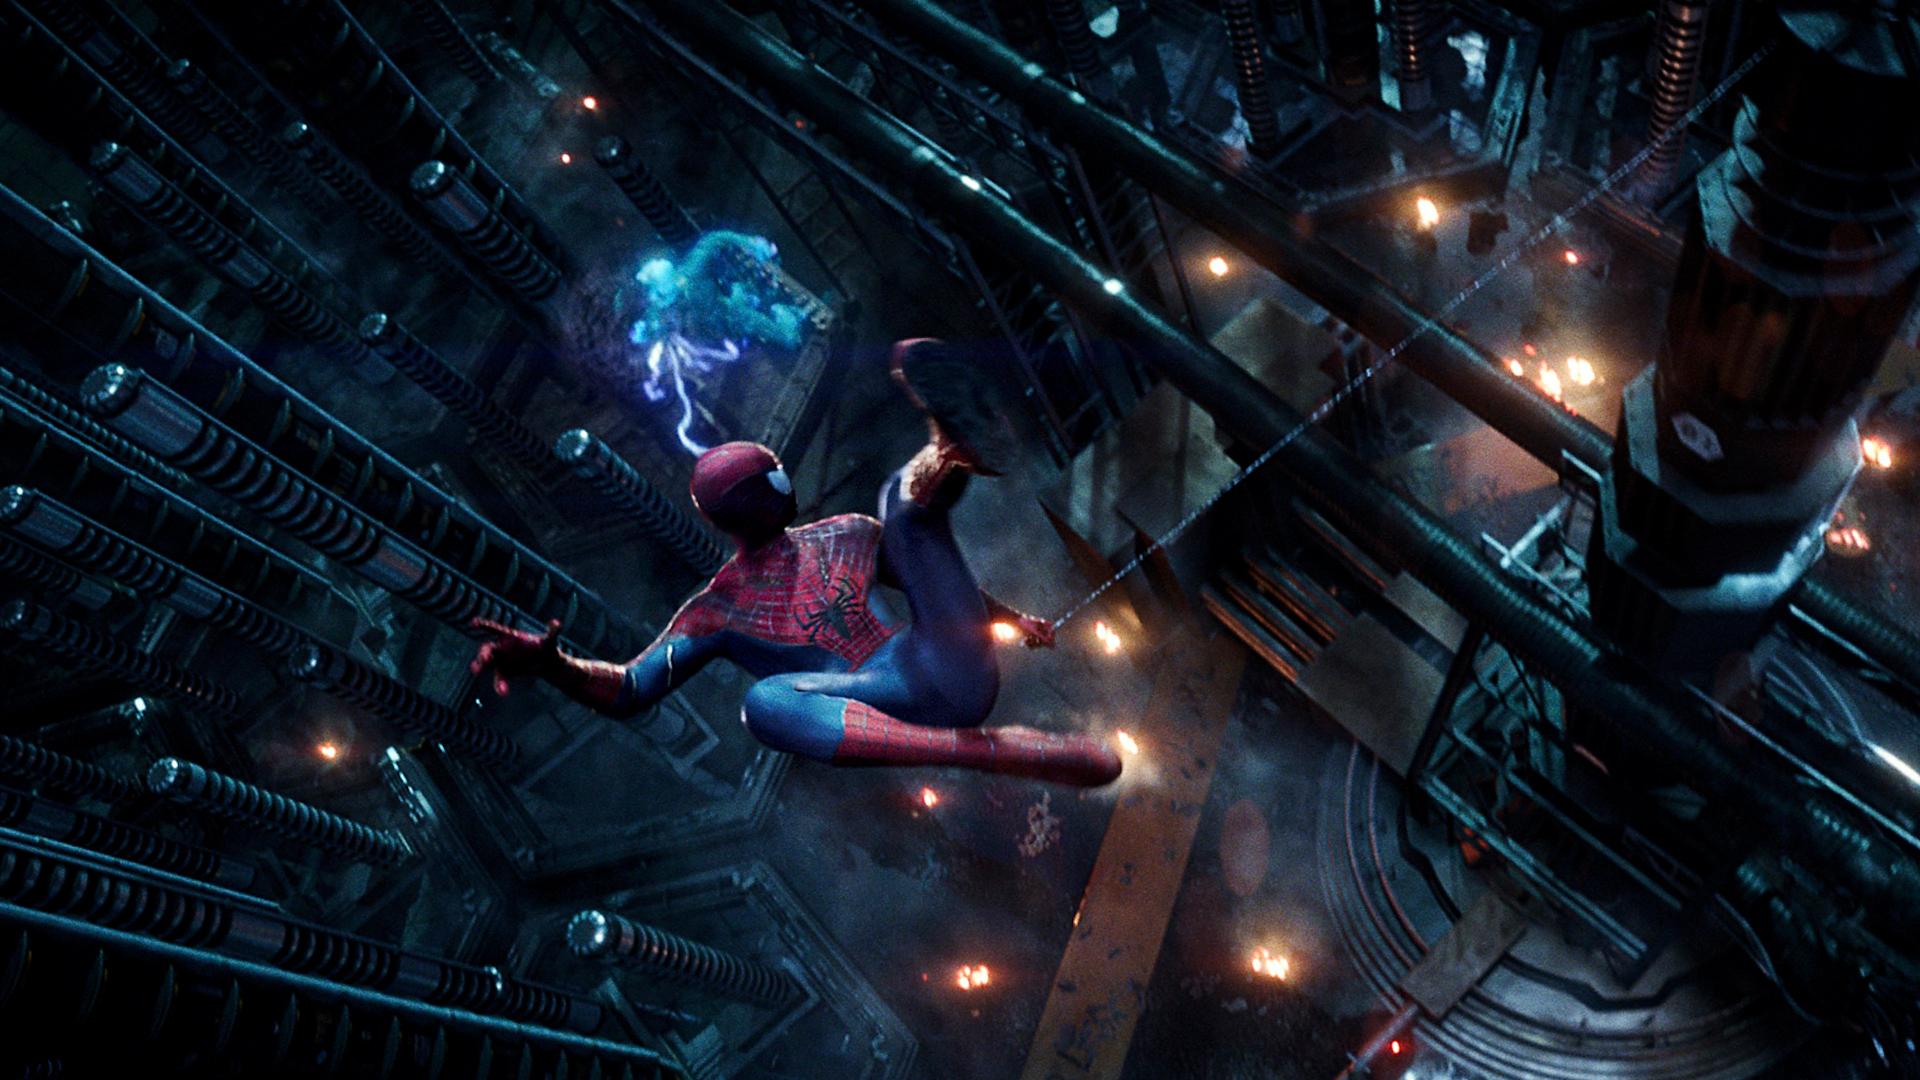 Spiderman Wallpaper Hd 1080p Electro vs spider man the 1920x1080